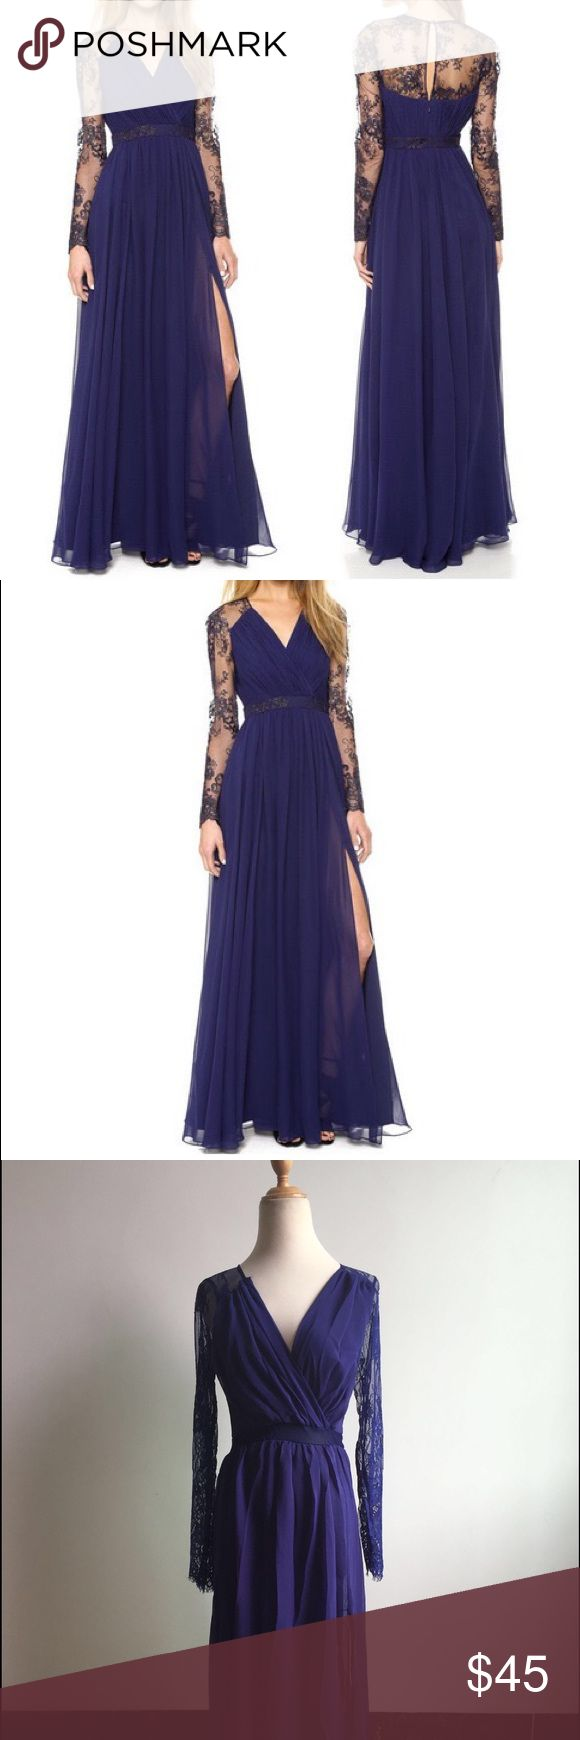 Navy blue maxi dress Polyester blend Dresses Maxi